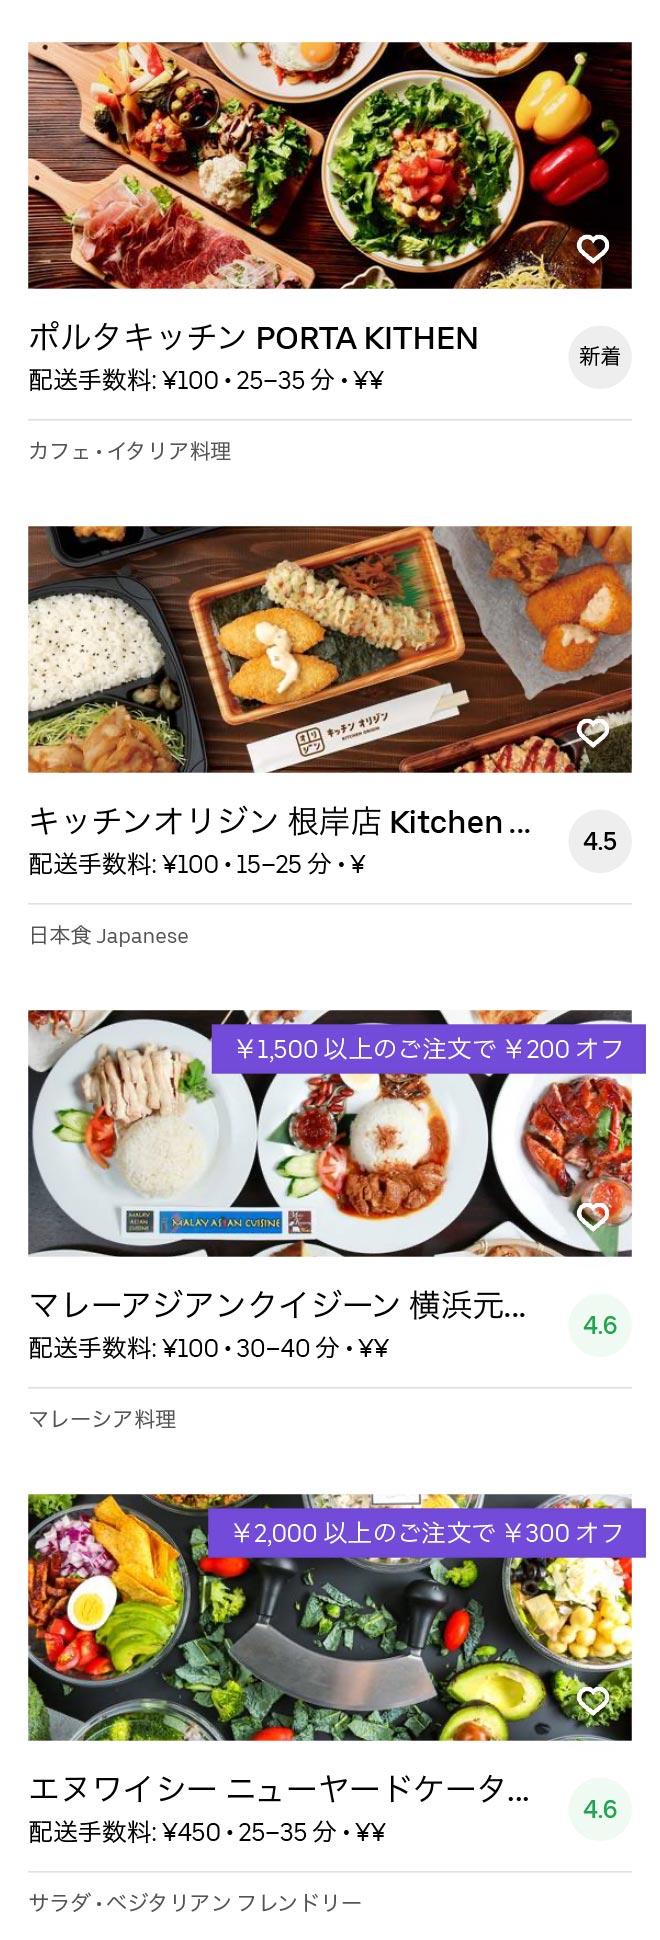 Yokohama negishi menu 2004 11